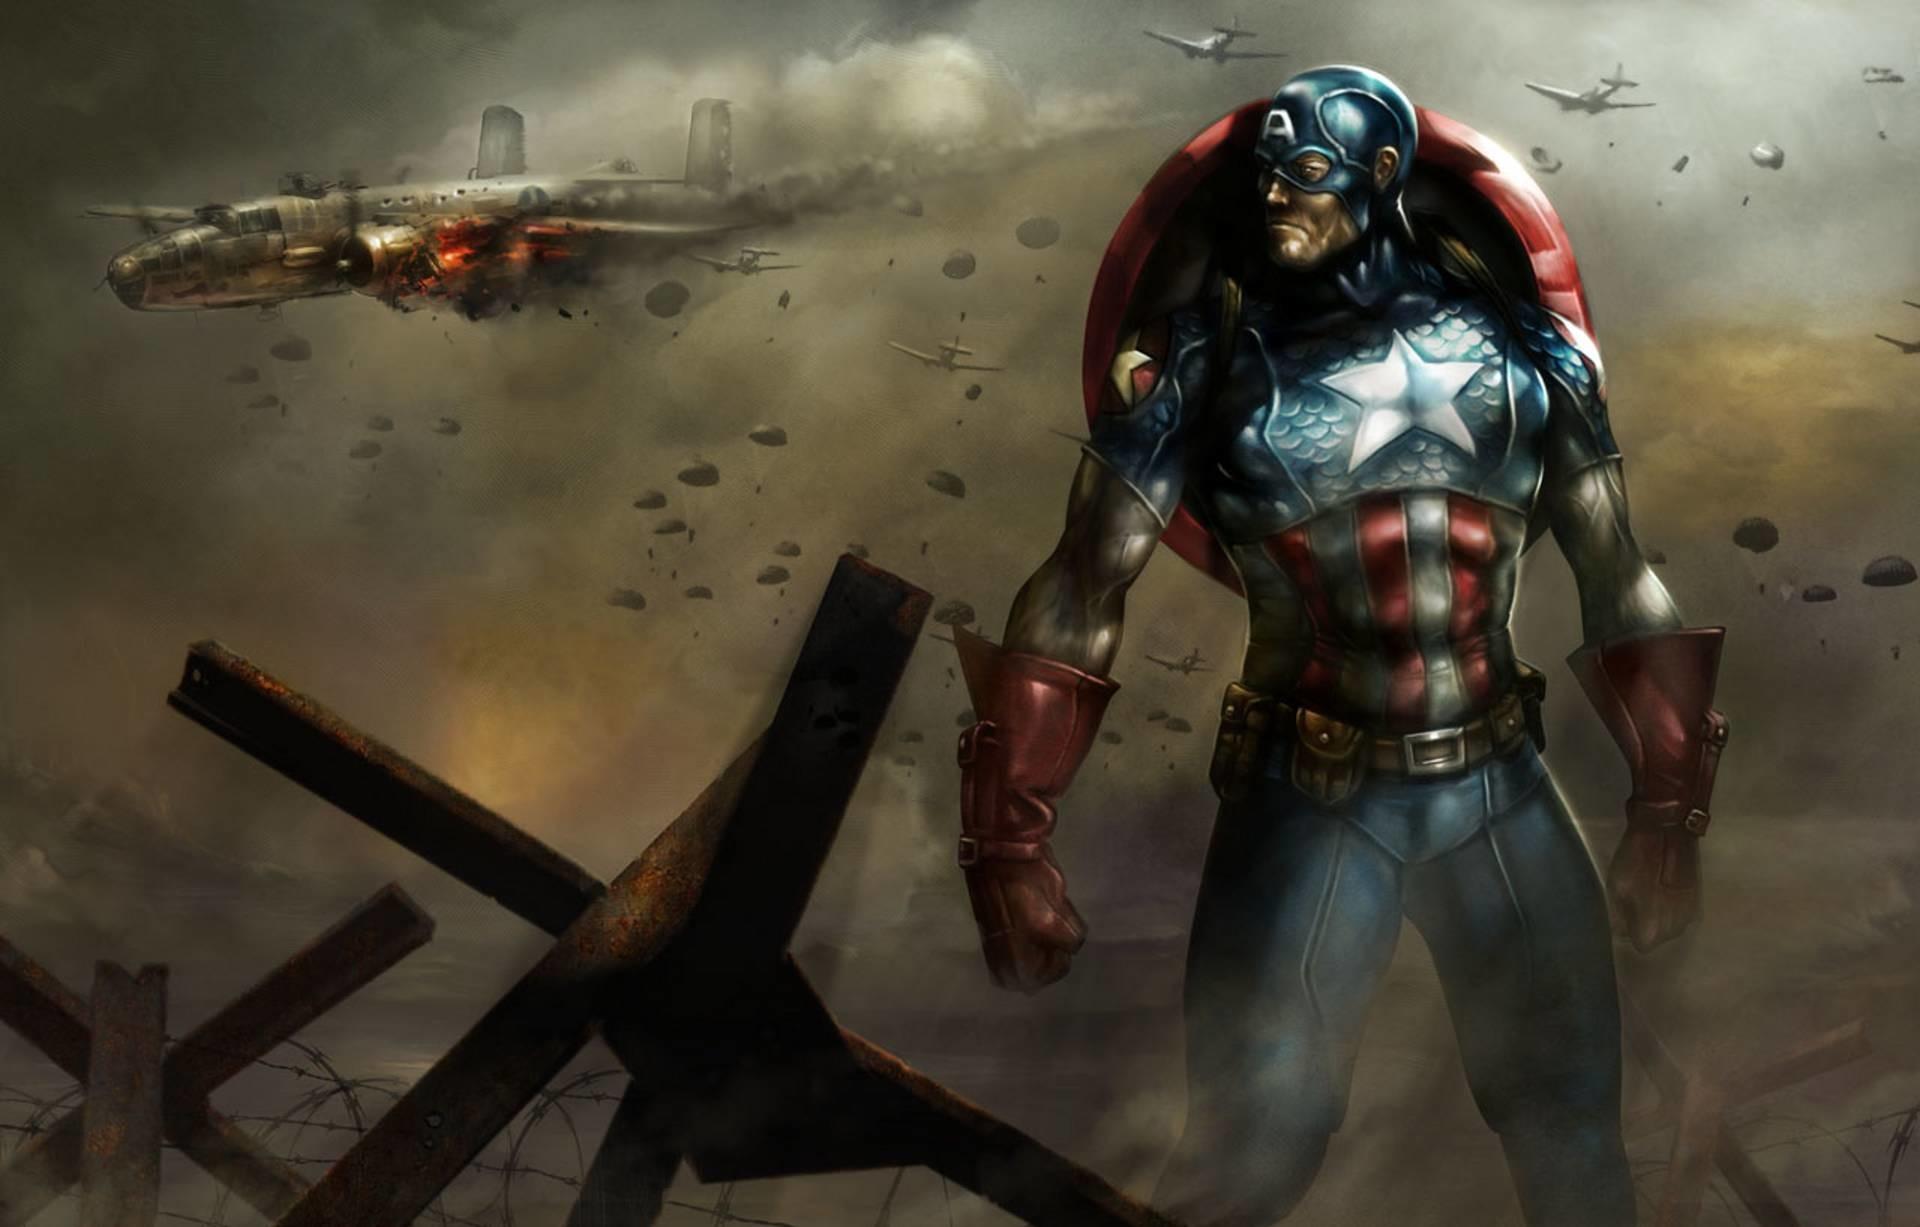 Marvel Comics, Chris Evans, Iron Man, The First Avenger, The Winter Soldier  · Marvel Comics, Hd Wallpaper …